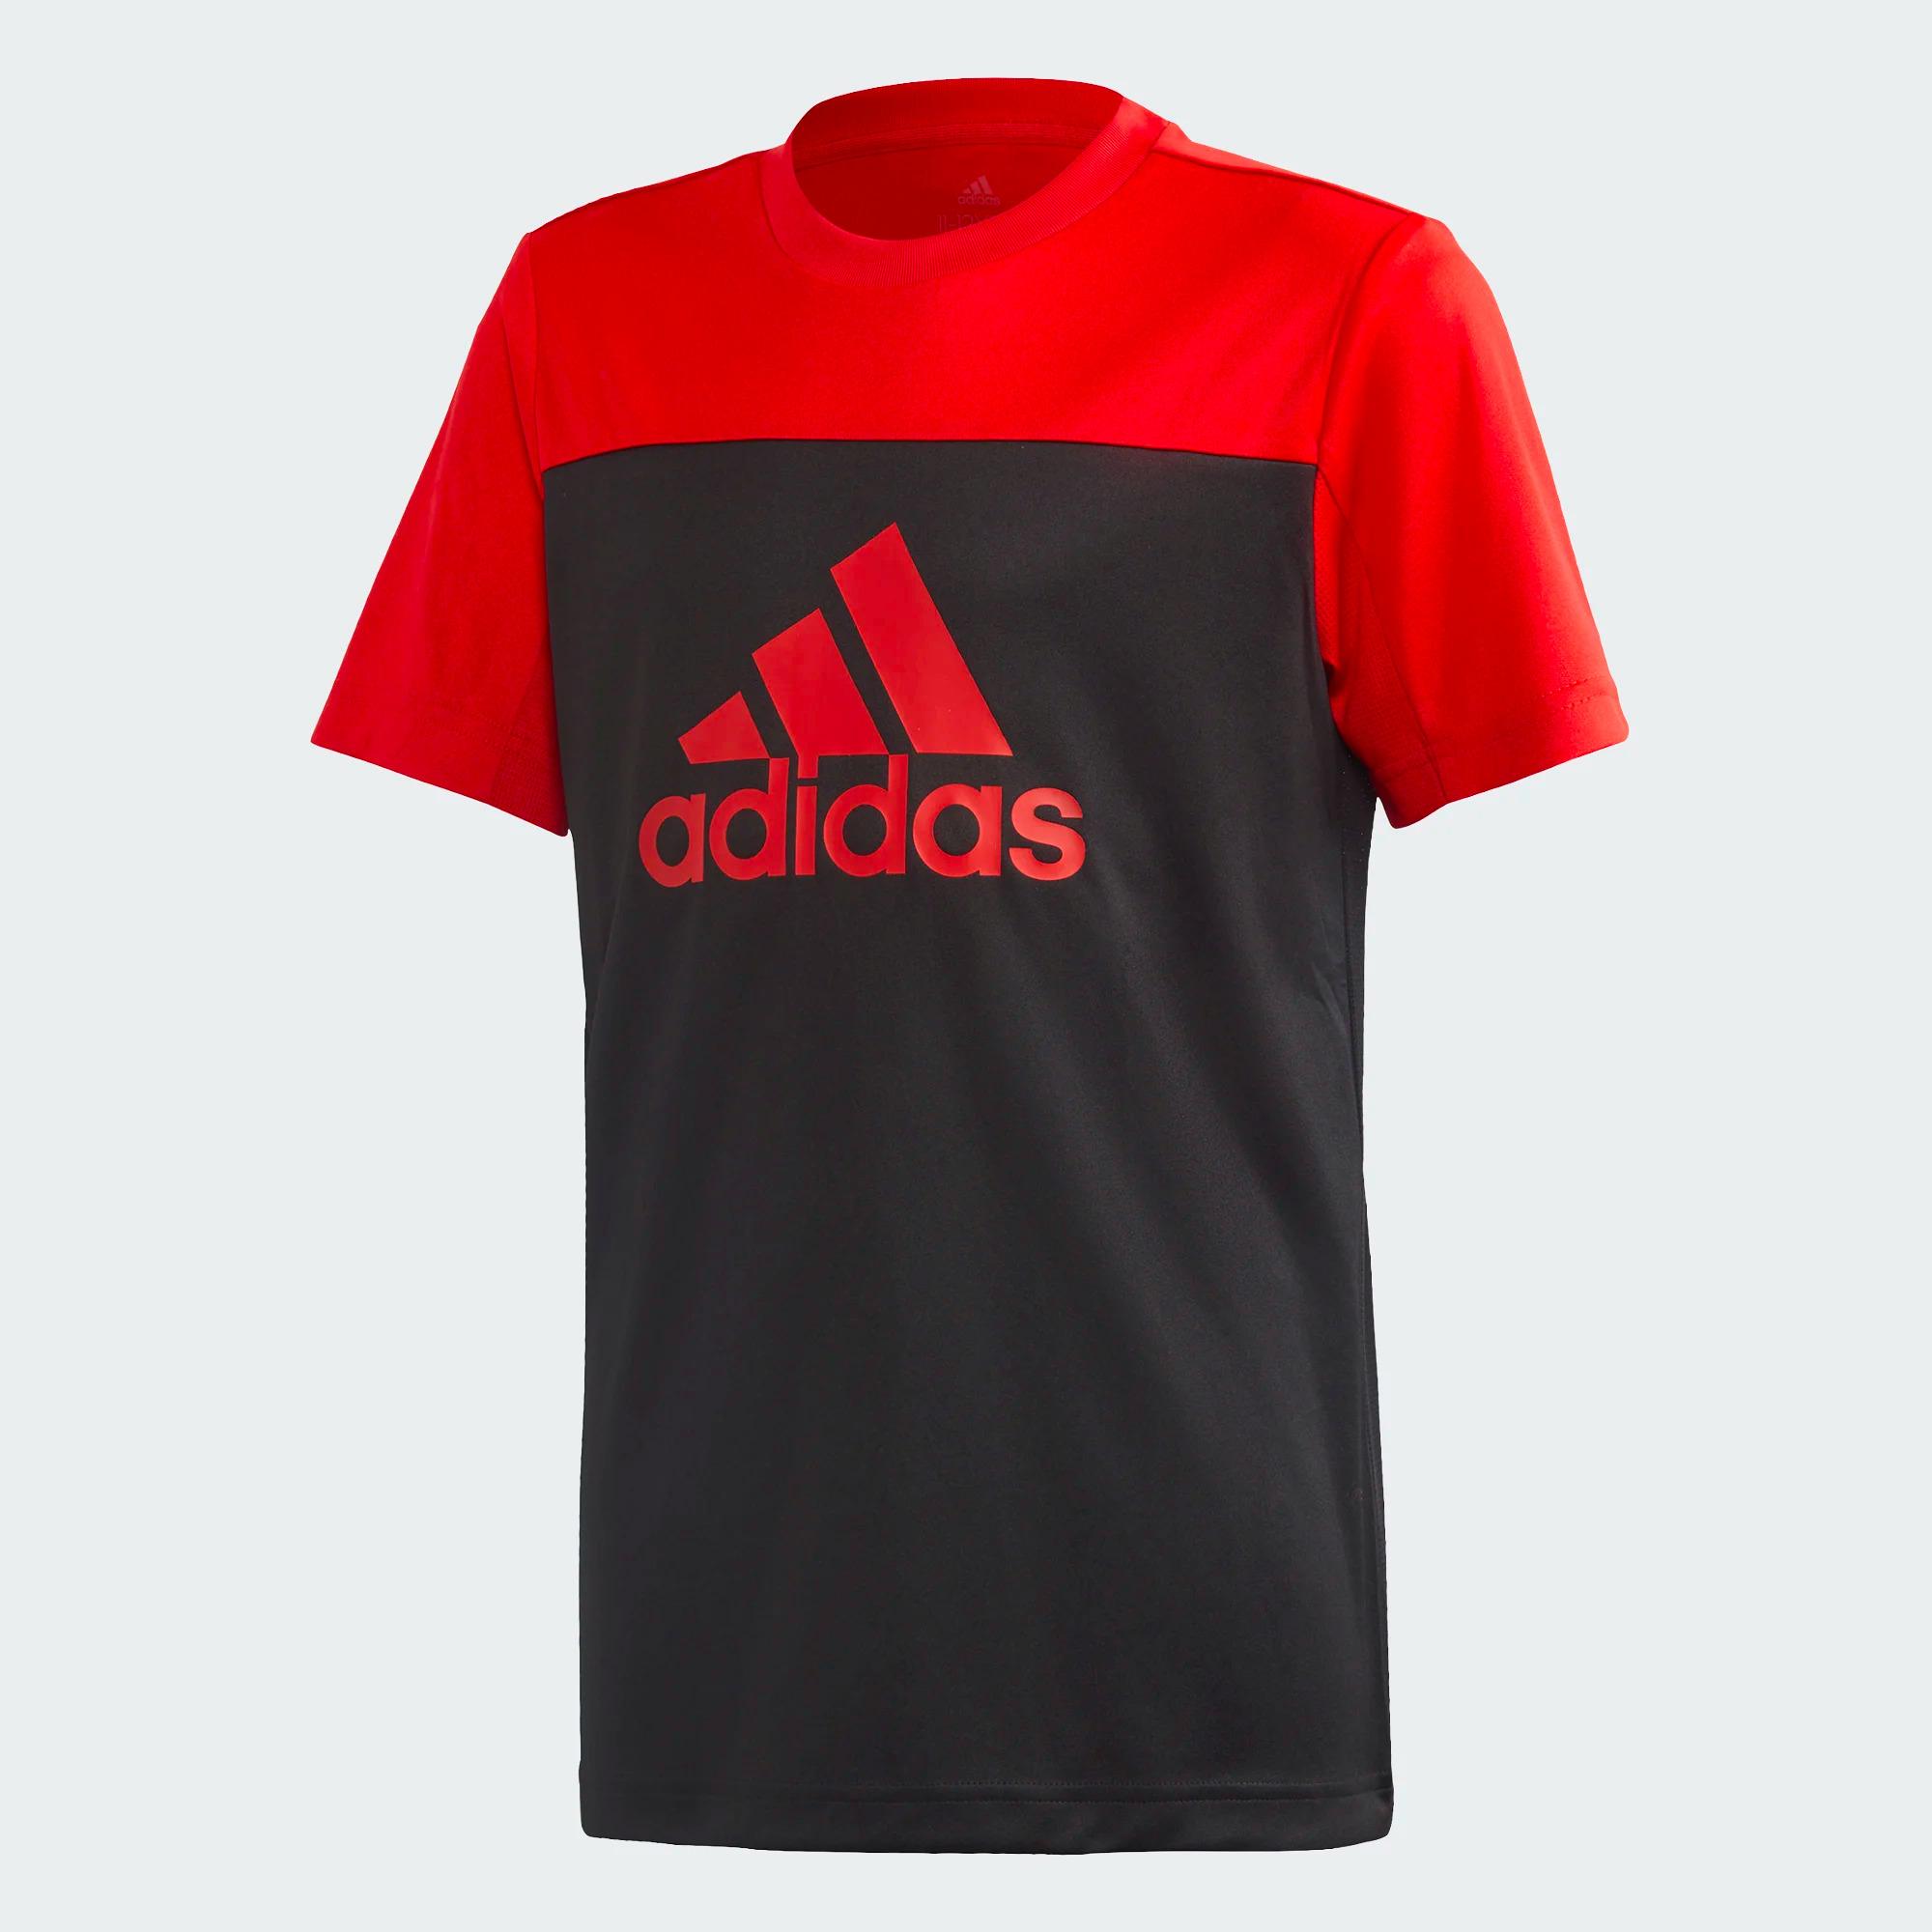 Adidas Kinder T-Shirt Equip - schwarz/rot